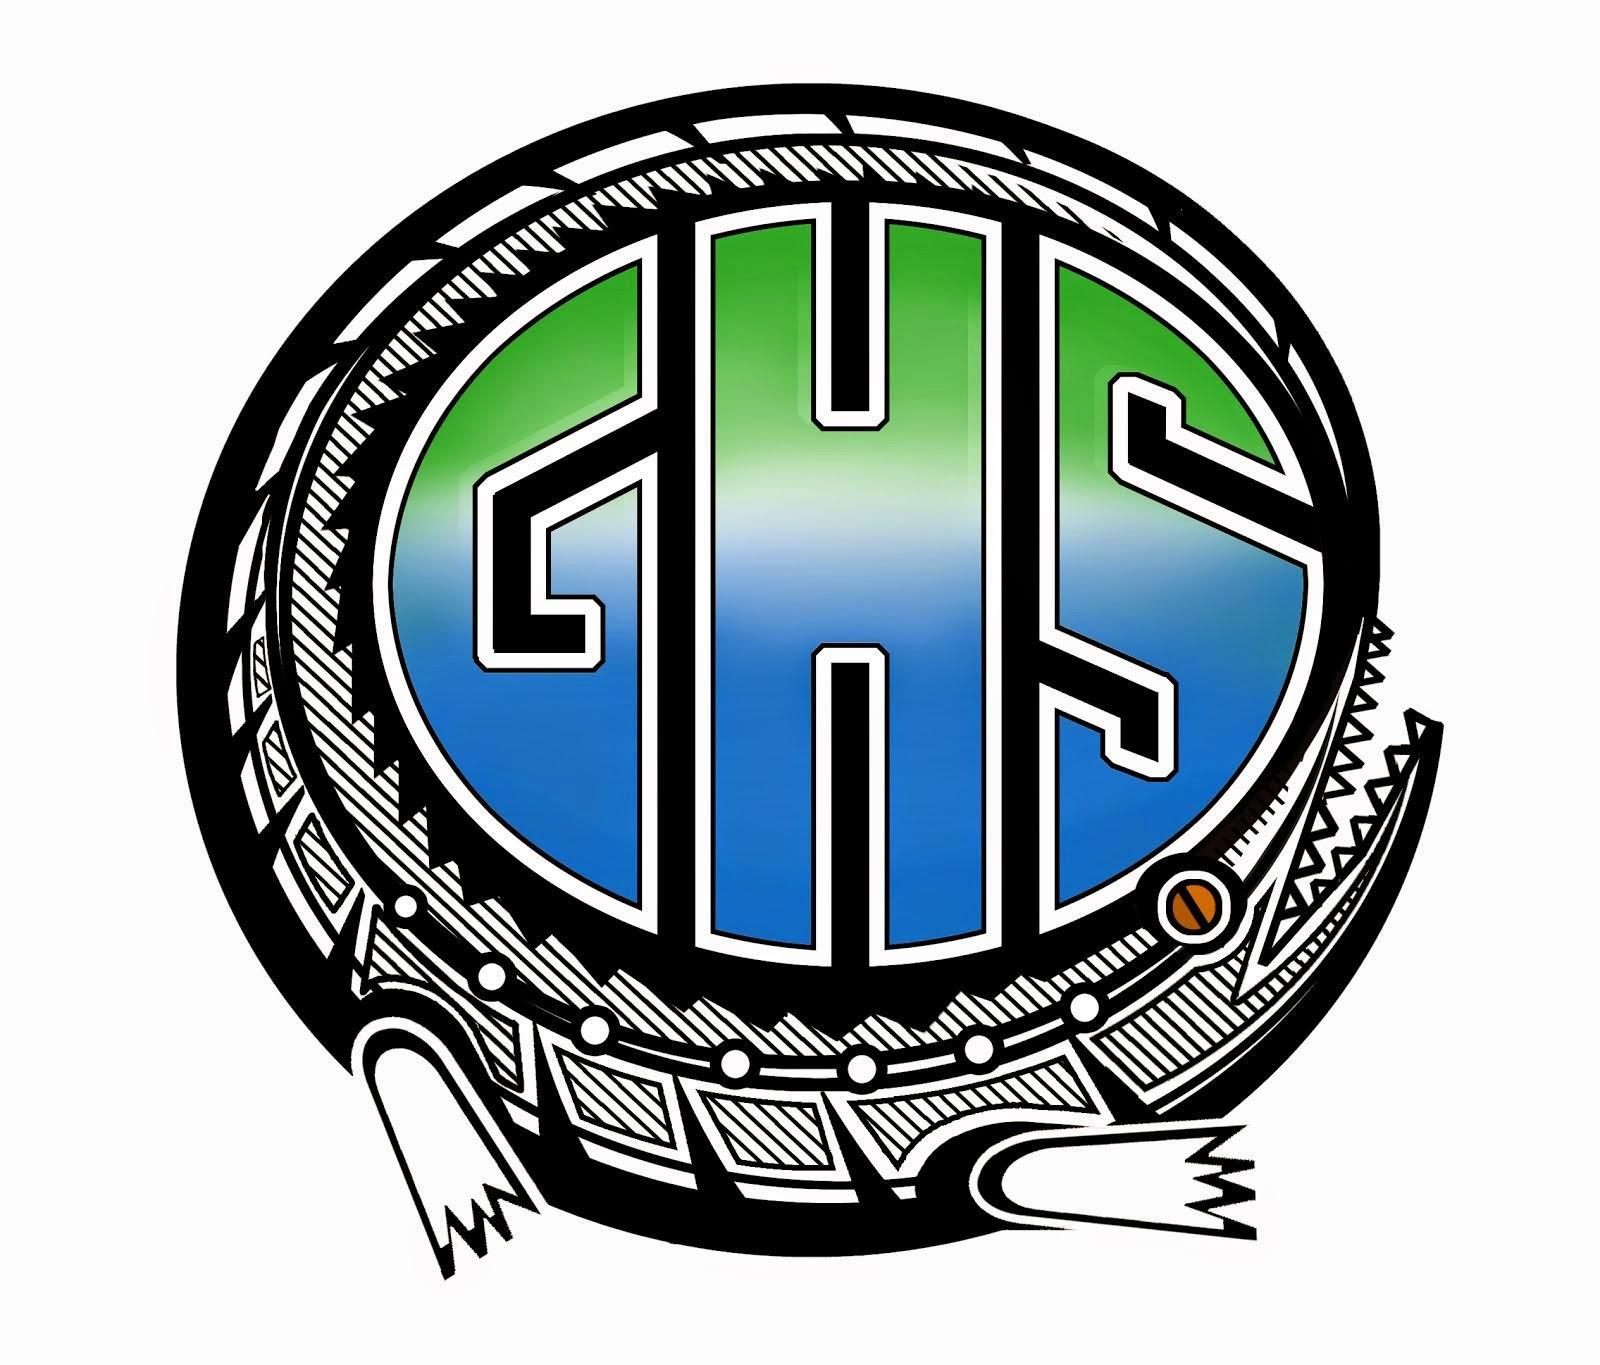 BHS_Final Gator logo color.jpg